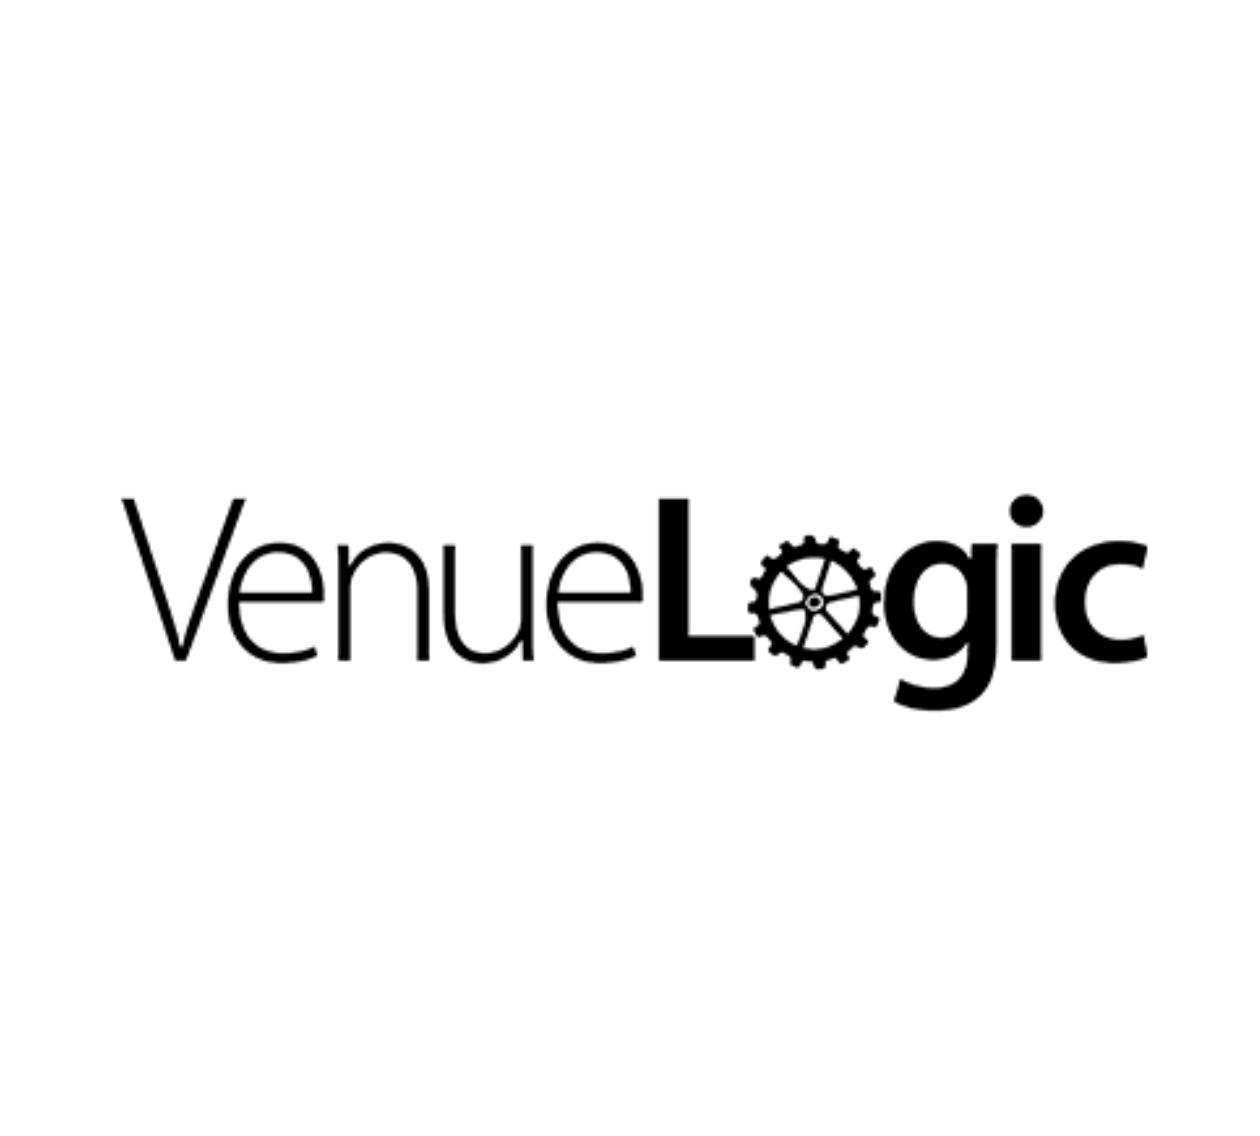 Venuelogic.png